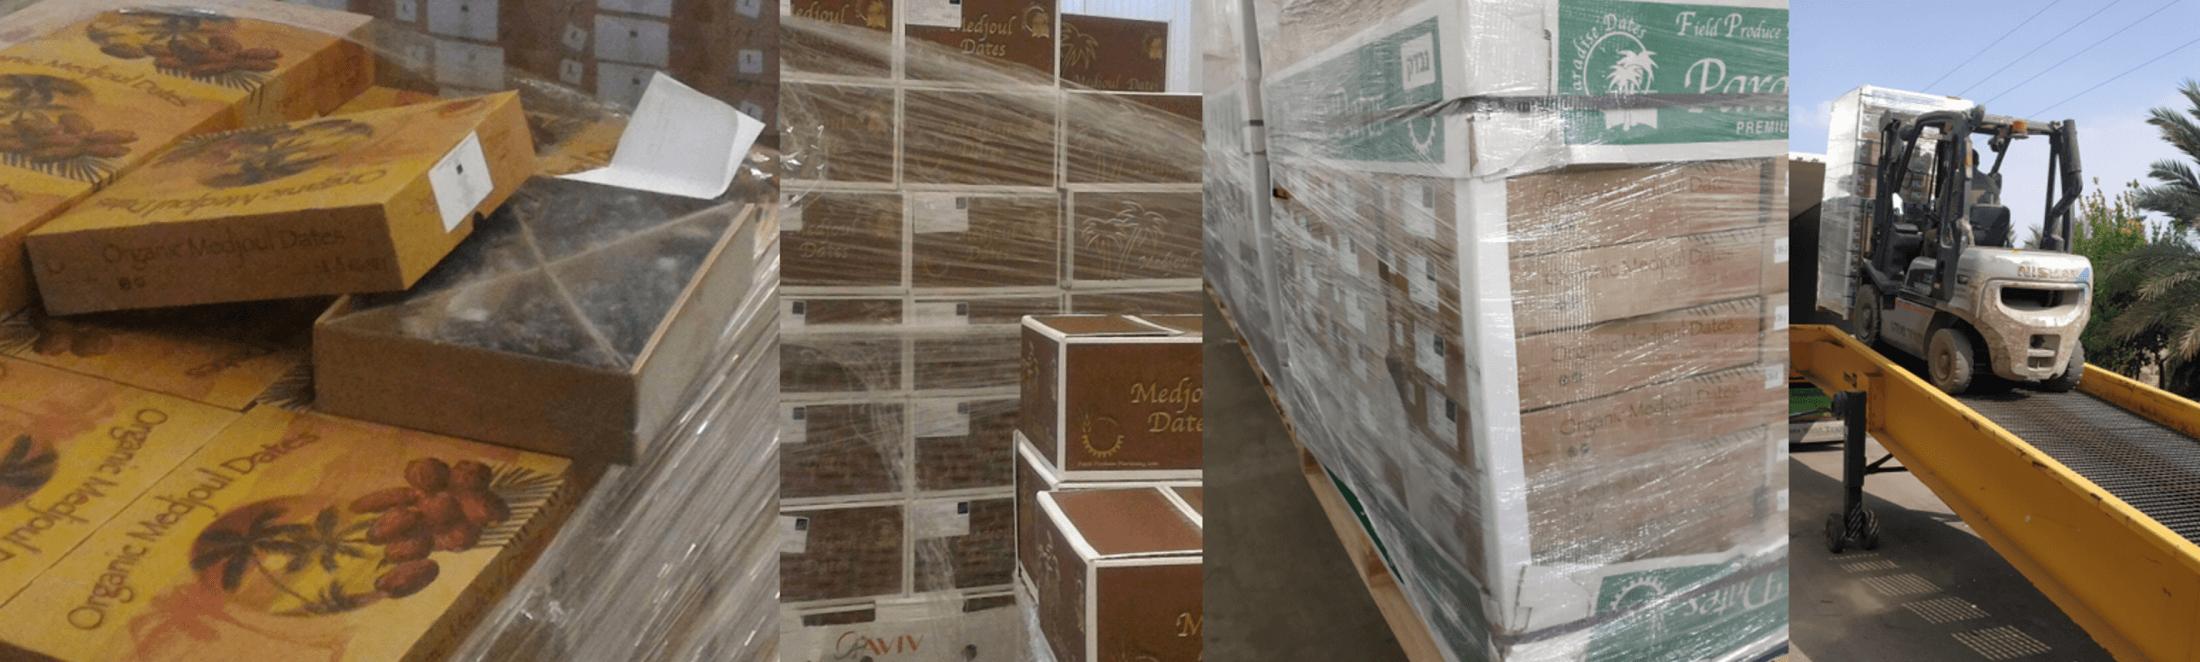 groothandel wholesale bio medjool medjoul datteln dattes dadels dates dadler dadlar datiles